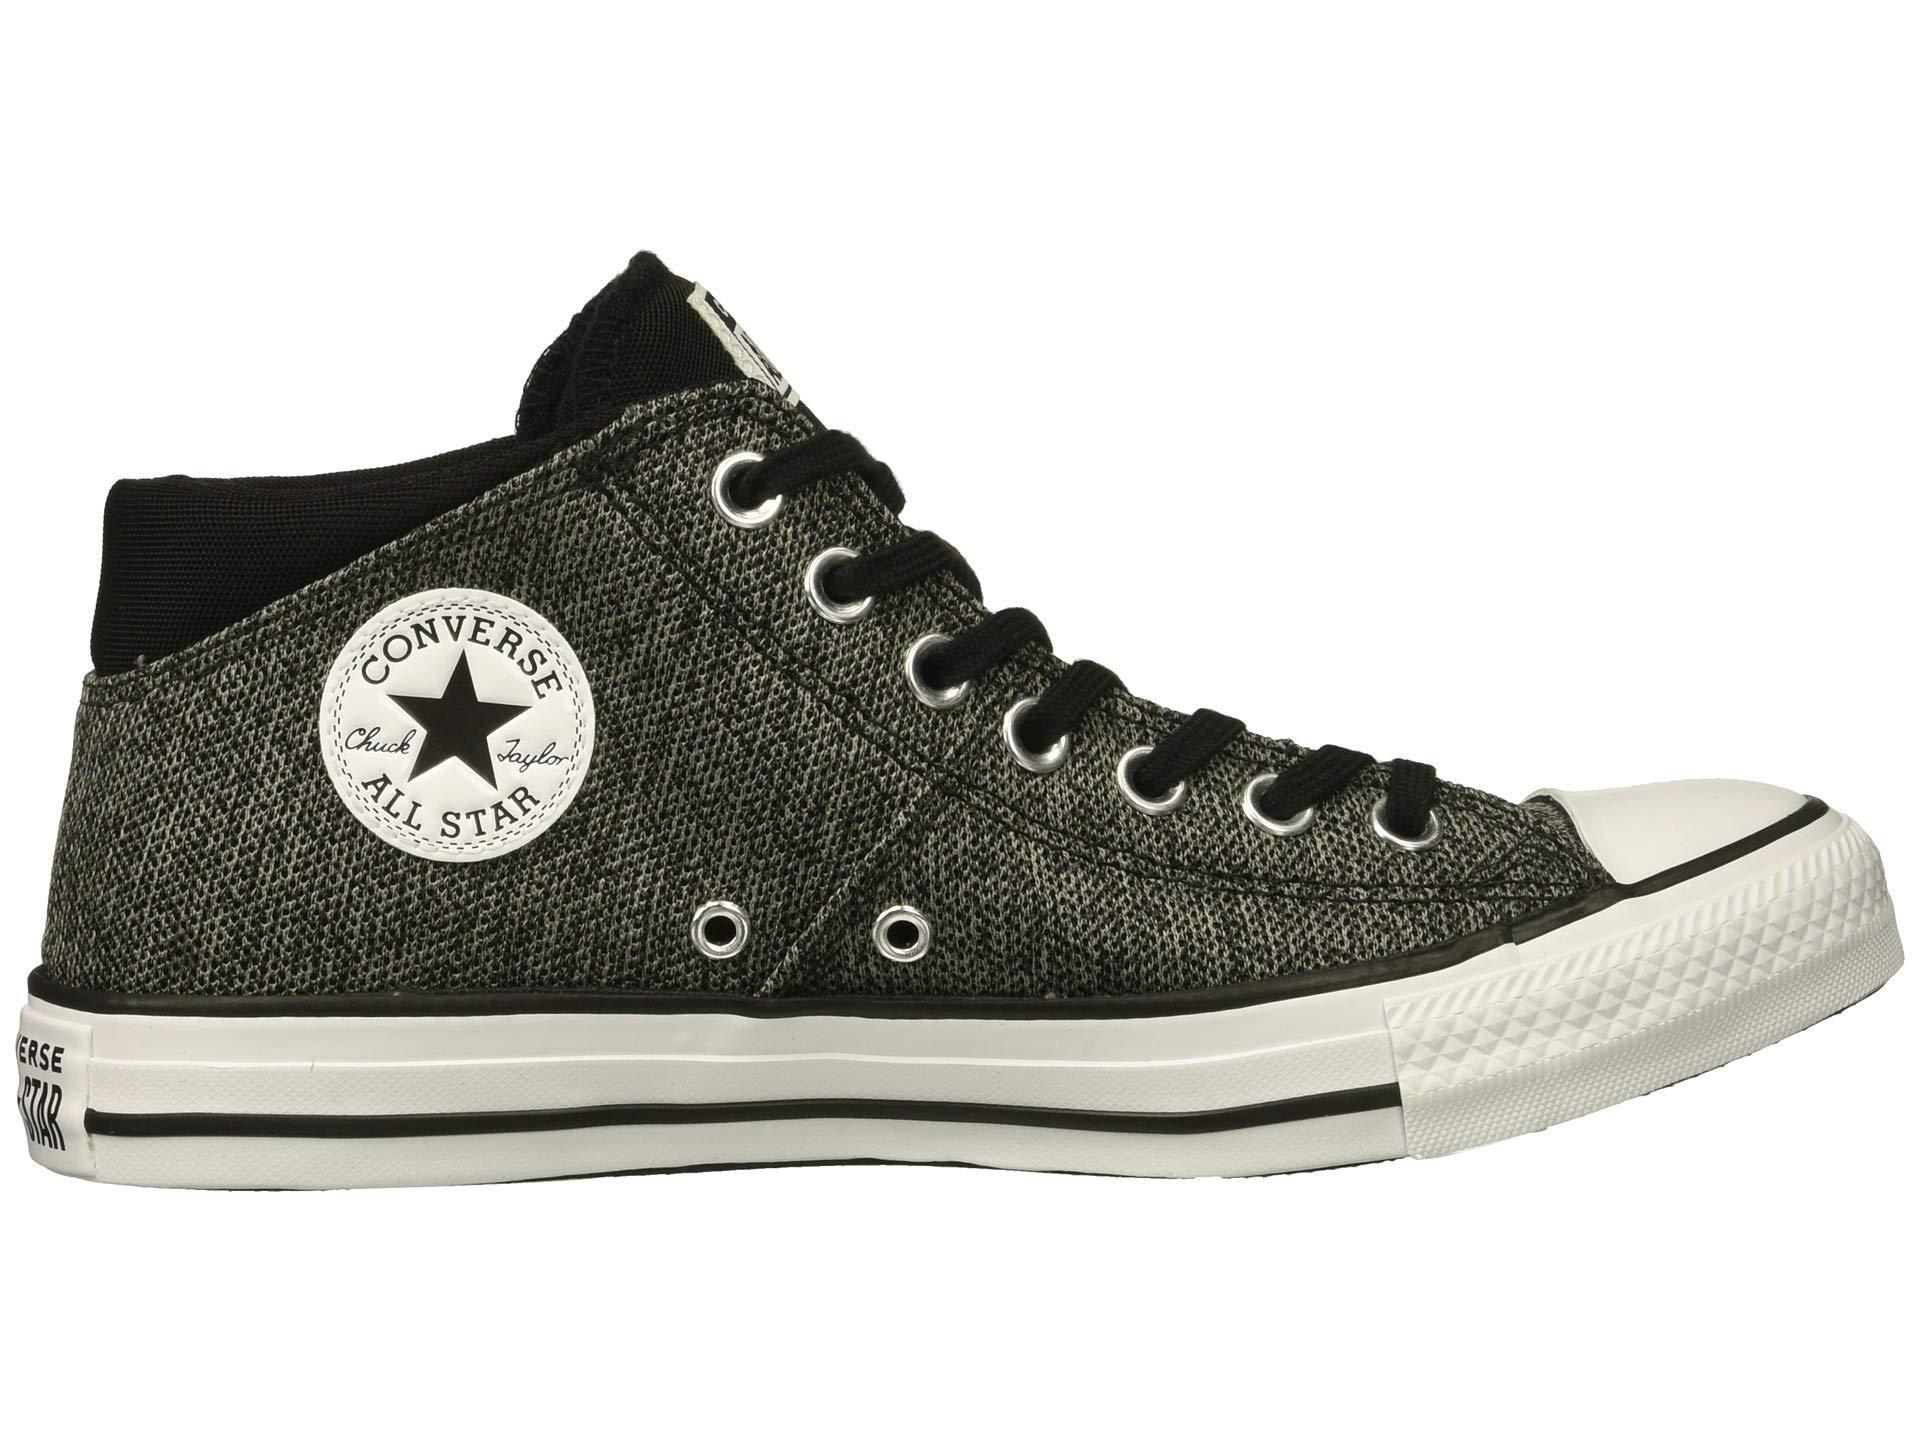 Converse Chuck Taylor All Star Knit